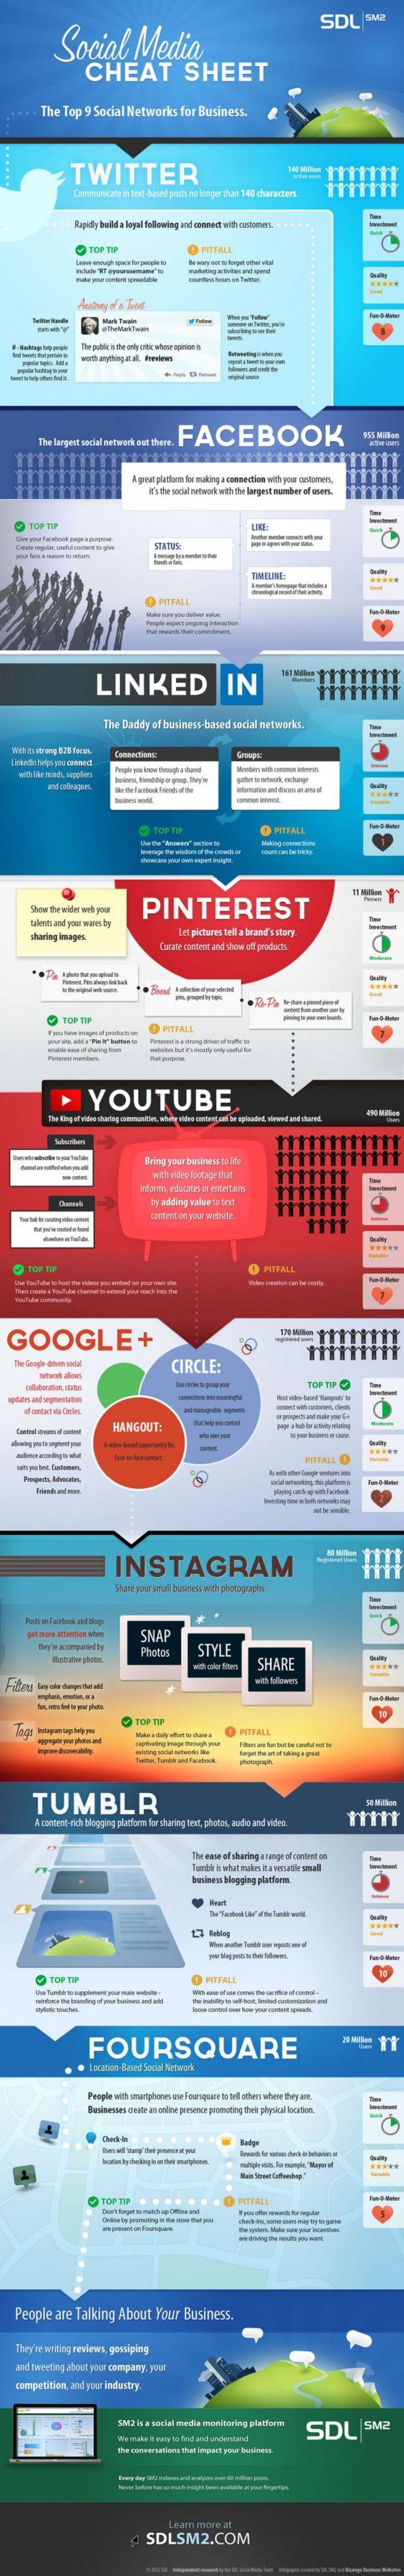 Social Media Cheat Sheet Infographic